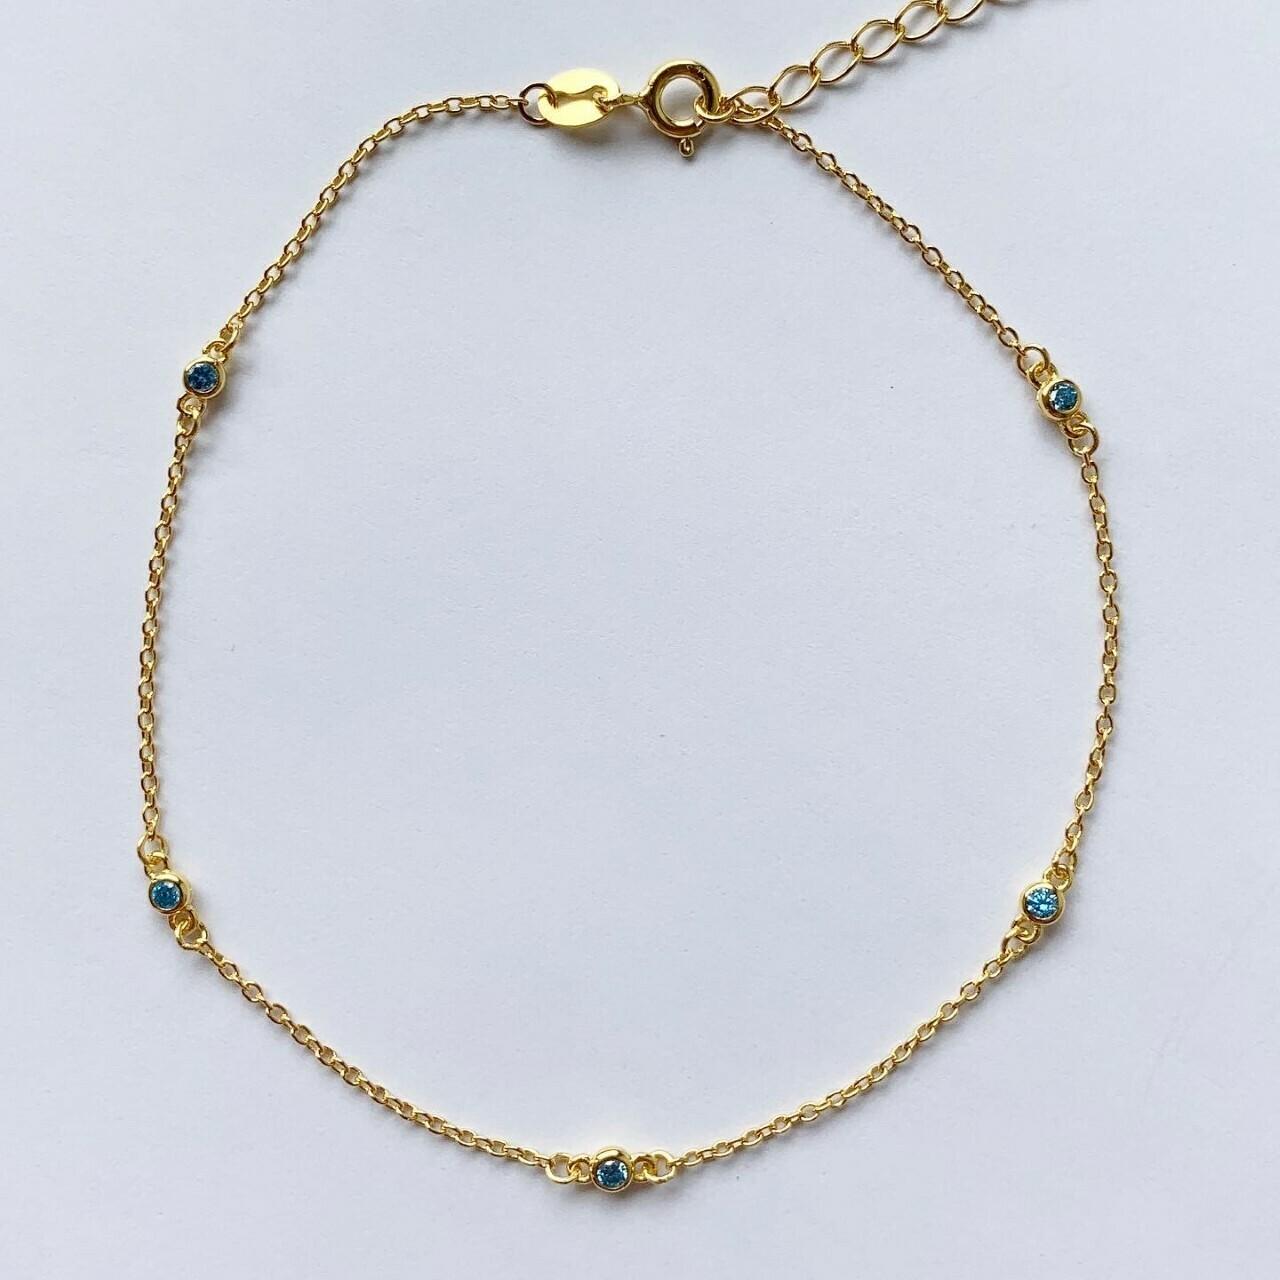 Enkelbandje met licht blauw tiny strass steentjes gold plated